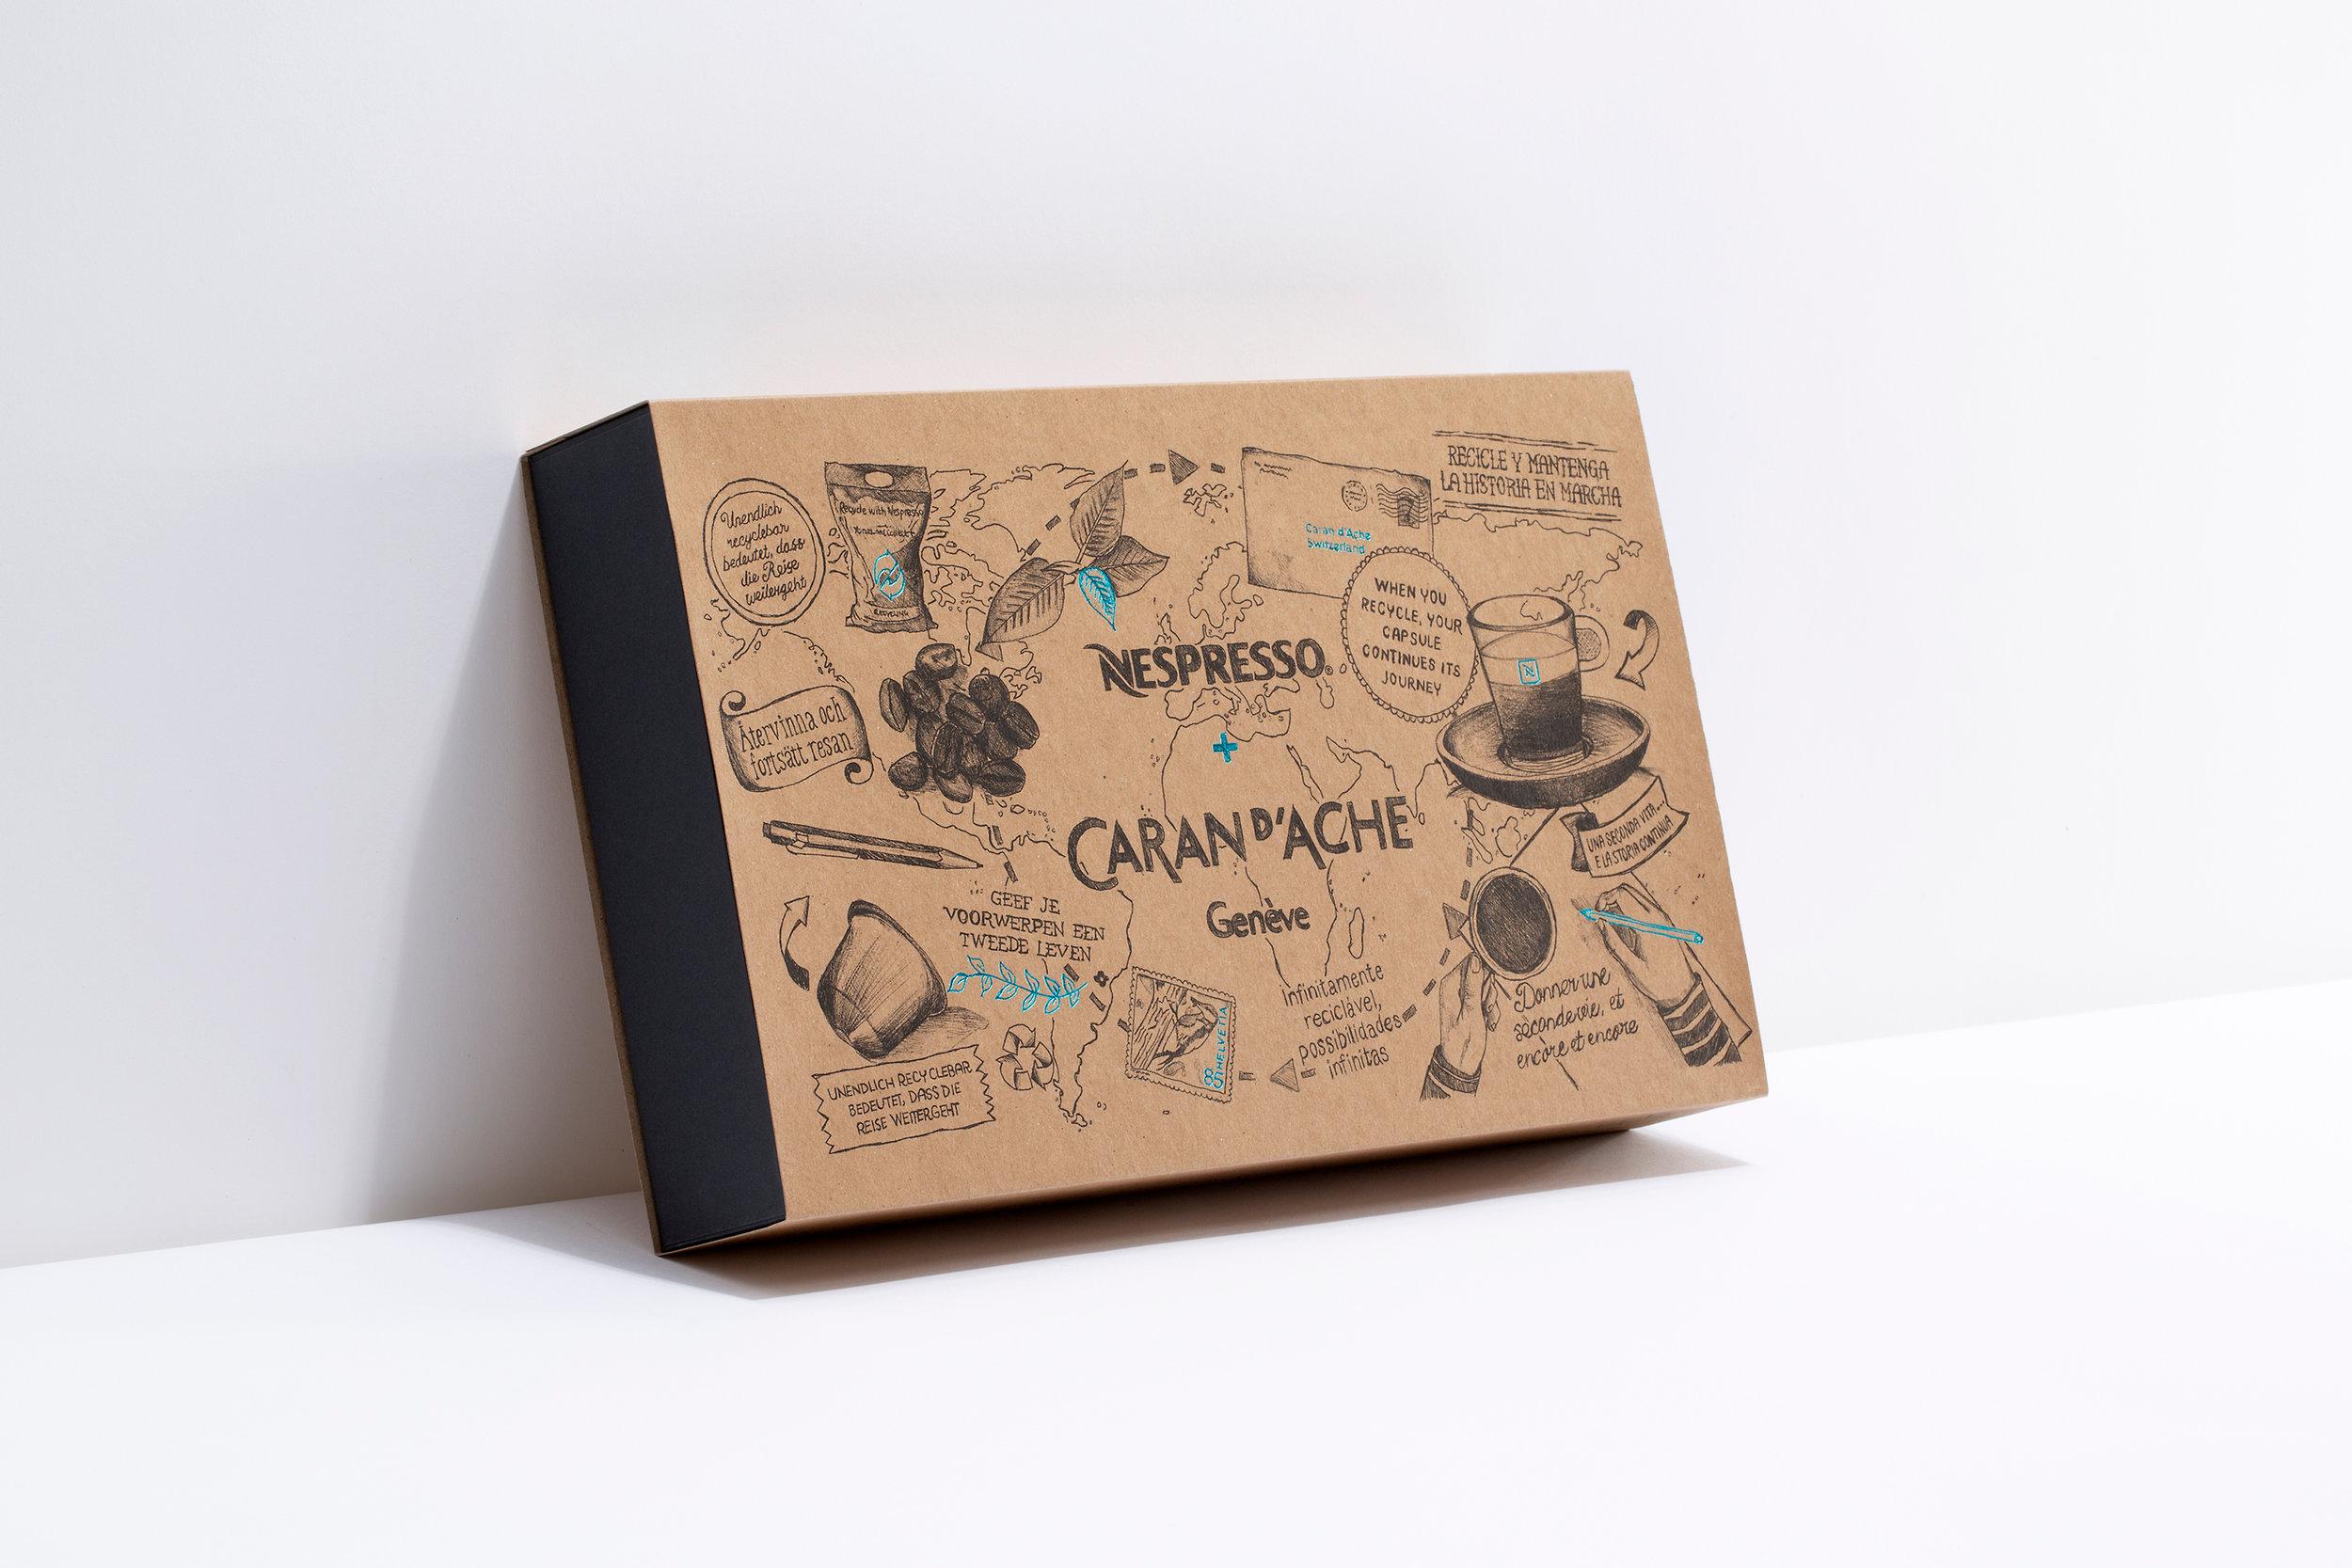 nespresso_carandache_box_1.jpg